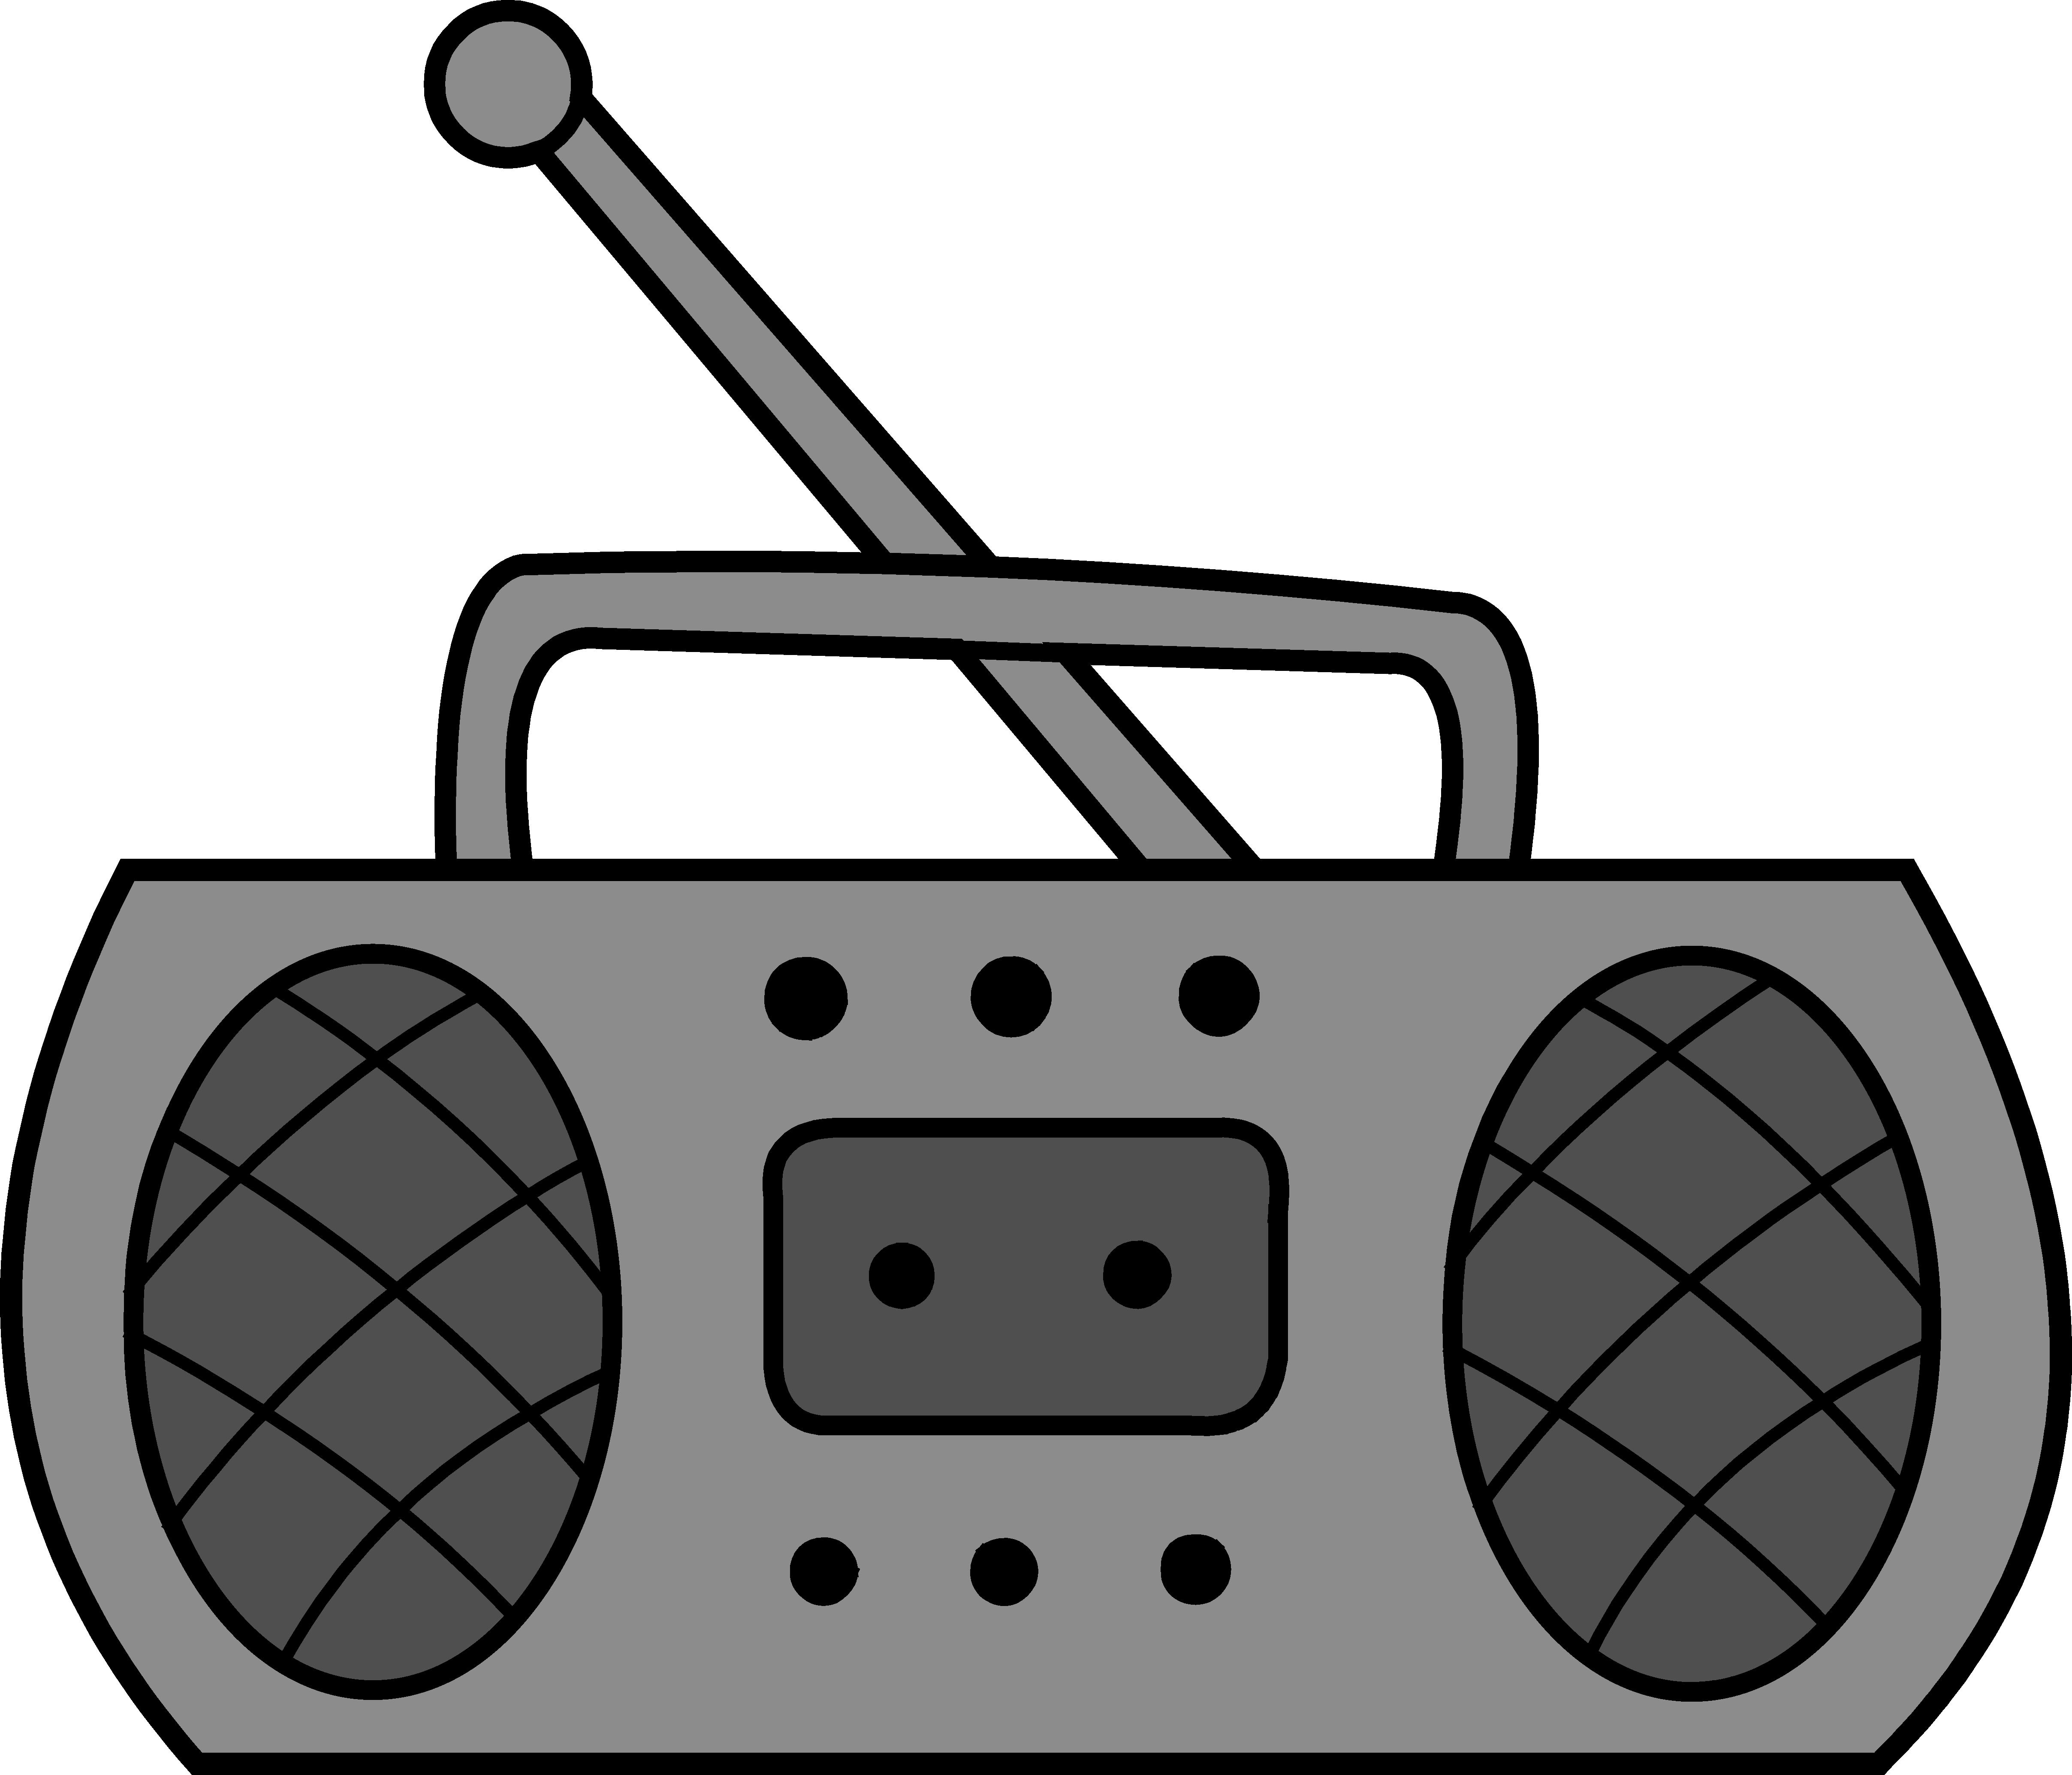 Radiio clipart graphic freeuse Cute Radio Clipart Design - Free Clip Art graphic freeuse